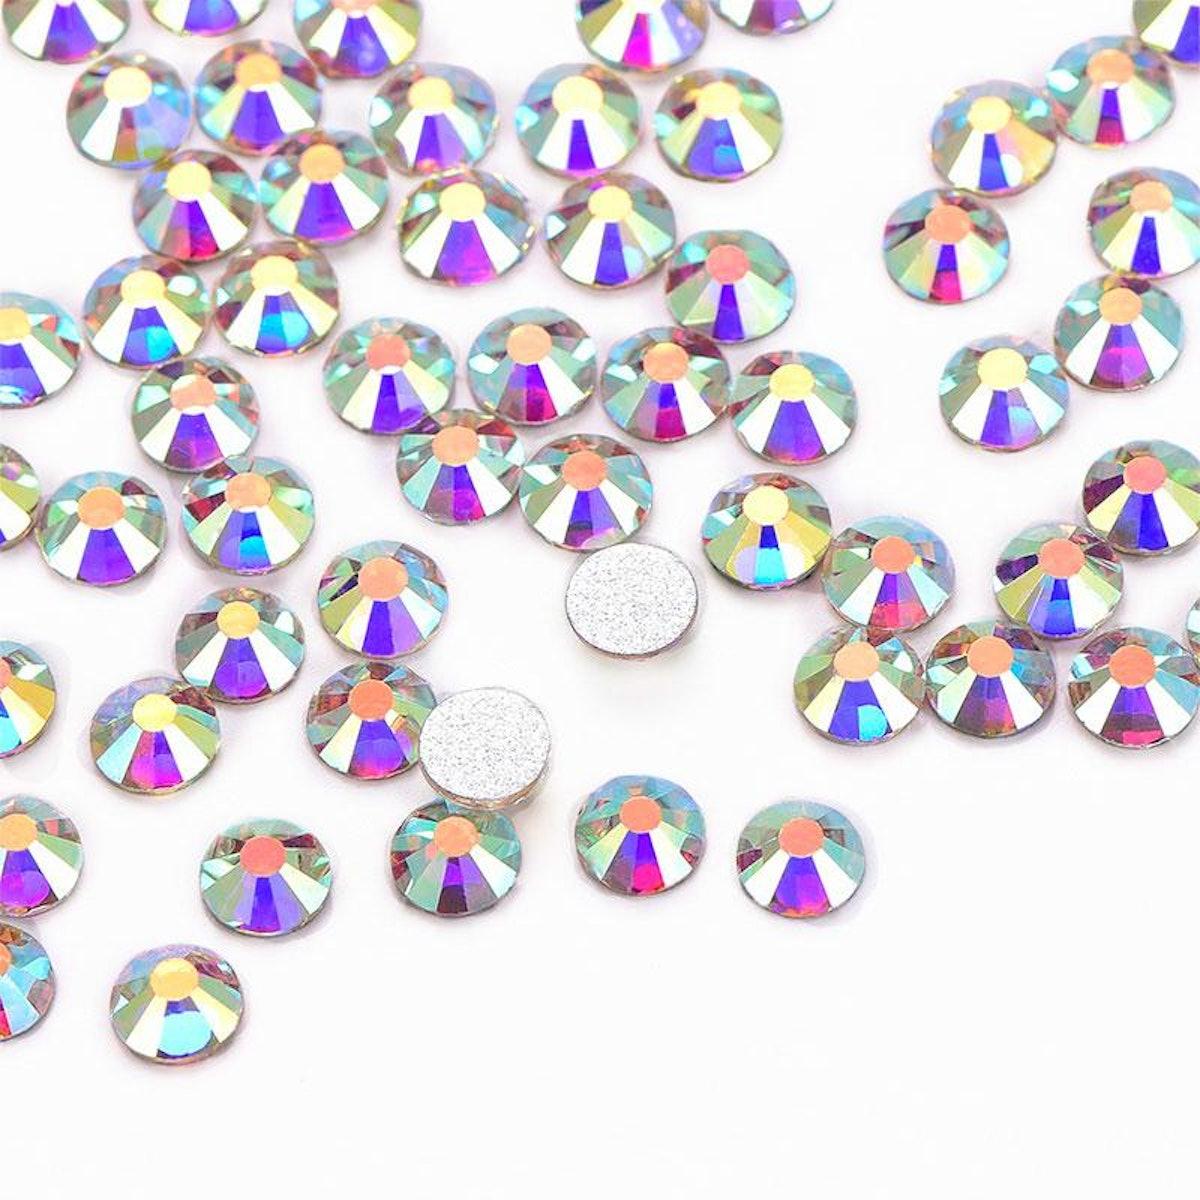 Wholesale Rhinestone Crystal AB Glass FlatBack Rhinestones, Silver Back